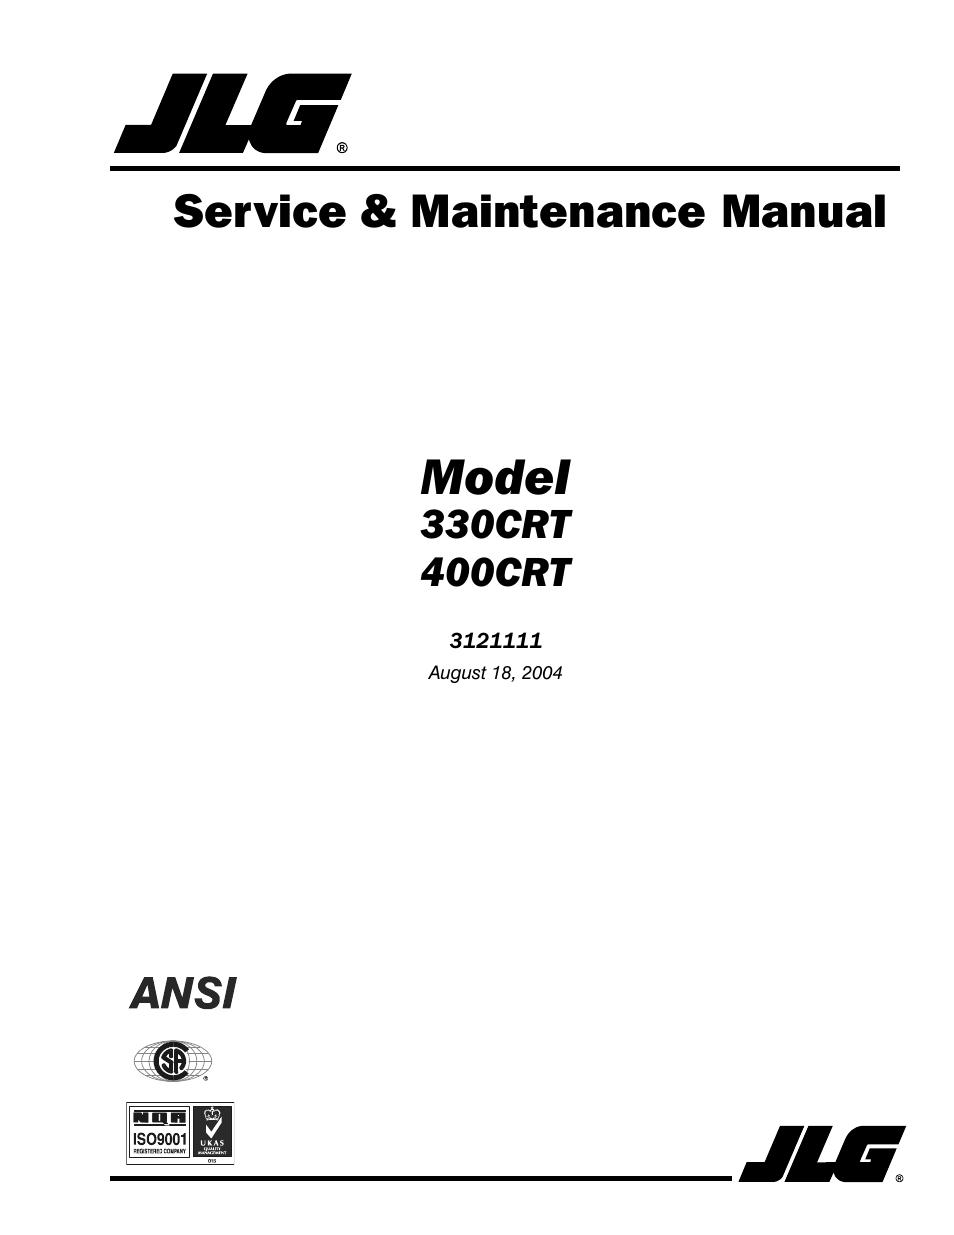 jlg aerial lift operators manual